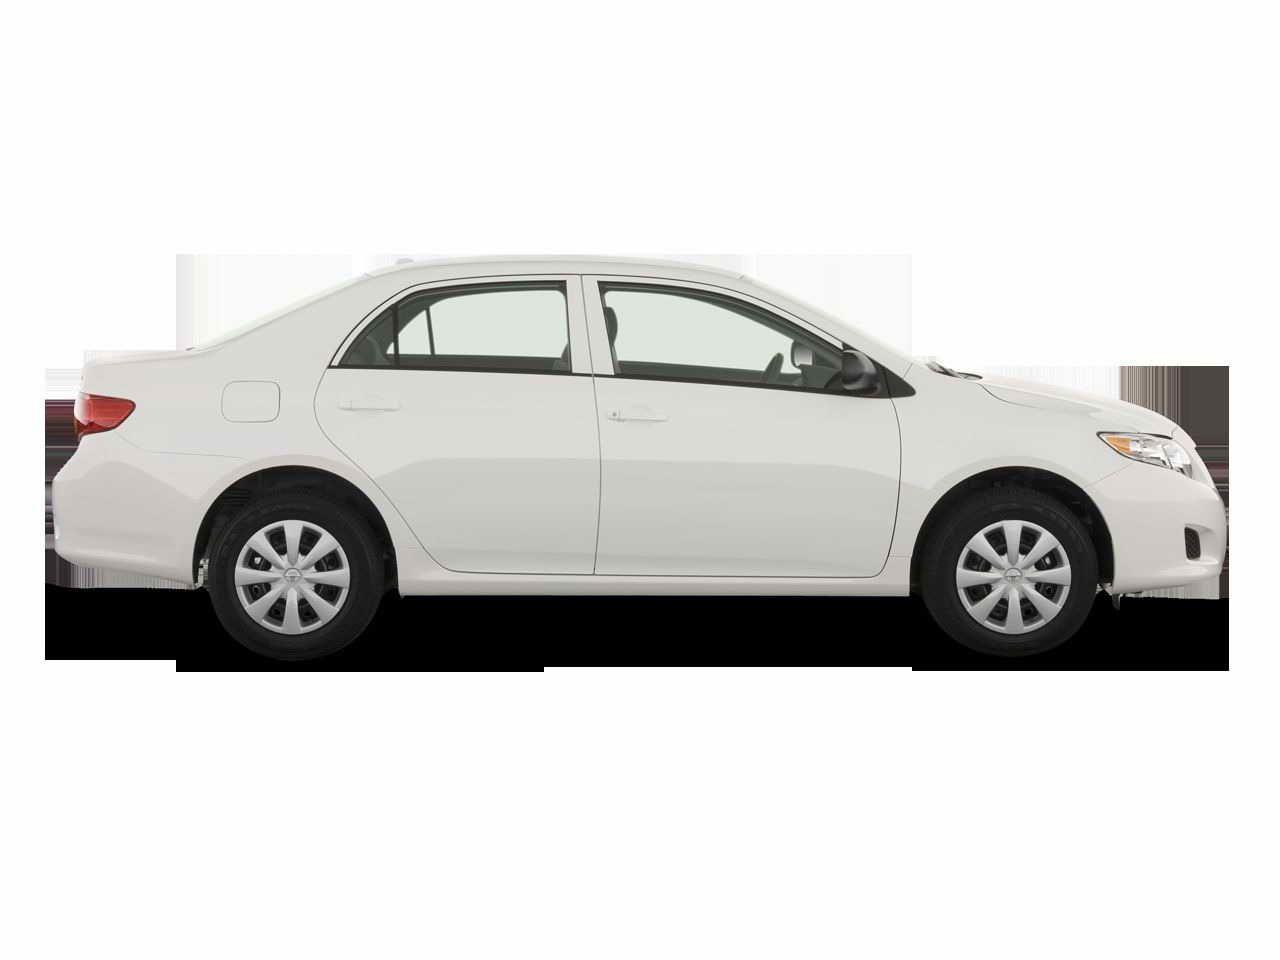 2010 Toyota Corolla Sport Tire Size